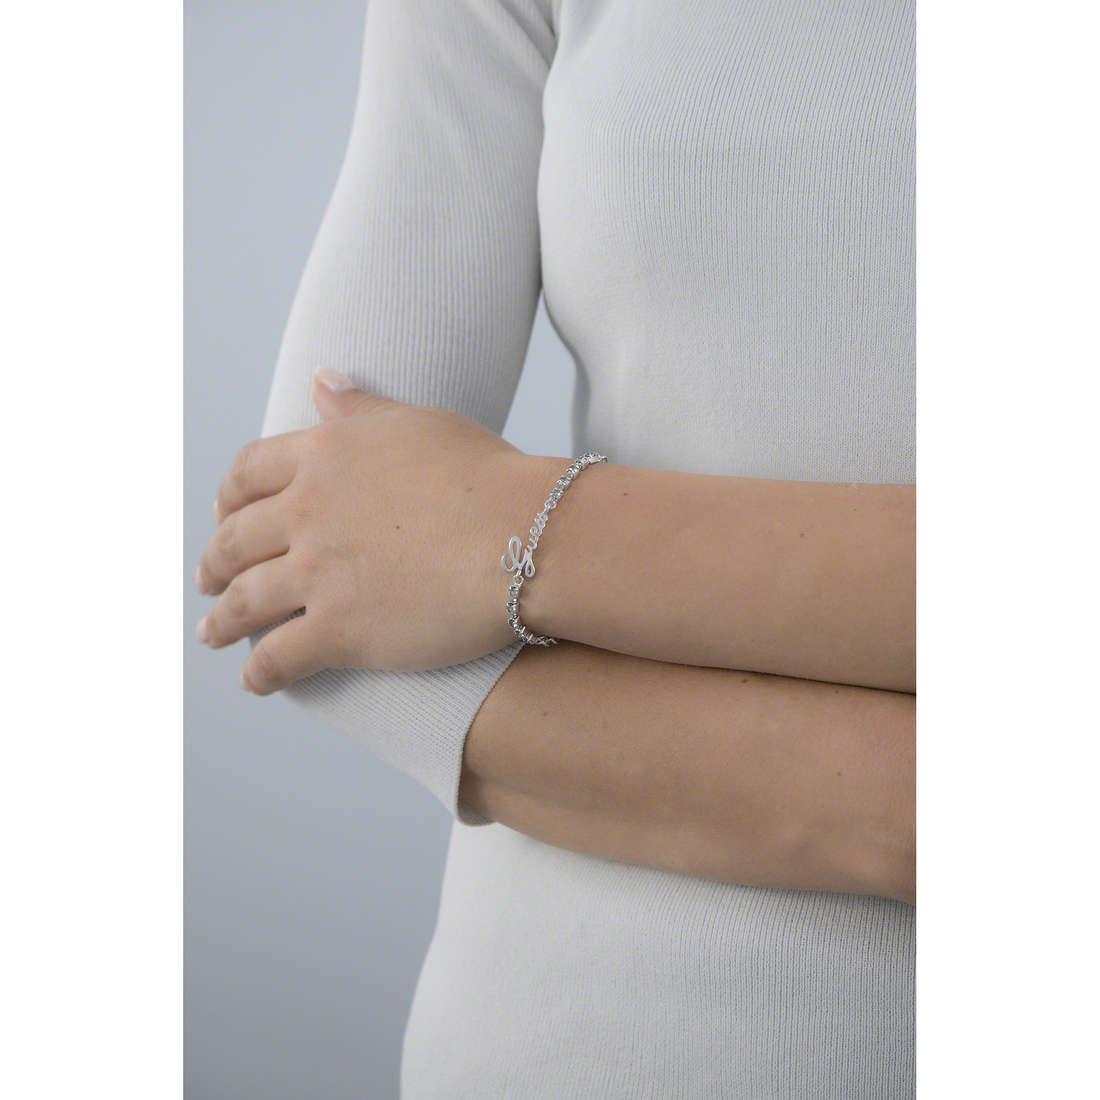 Guess bracelets femme UBB61087-S indosso